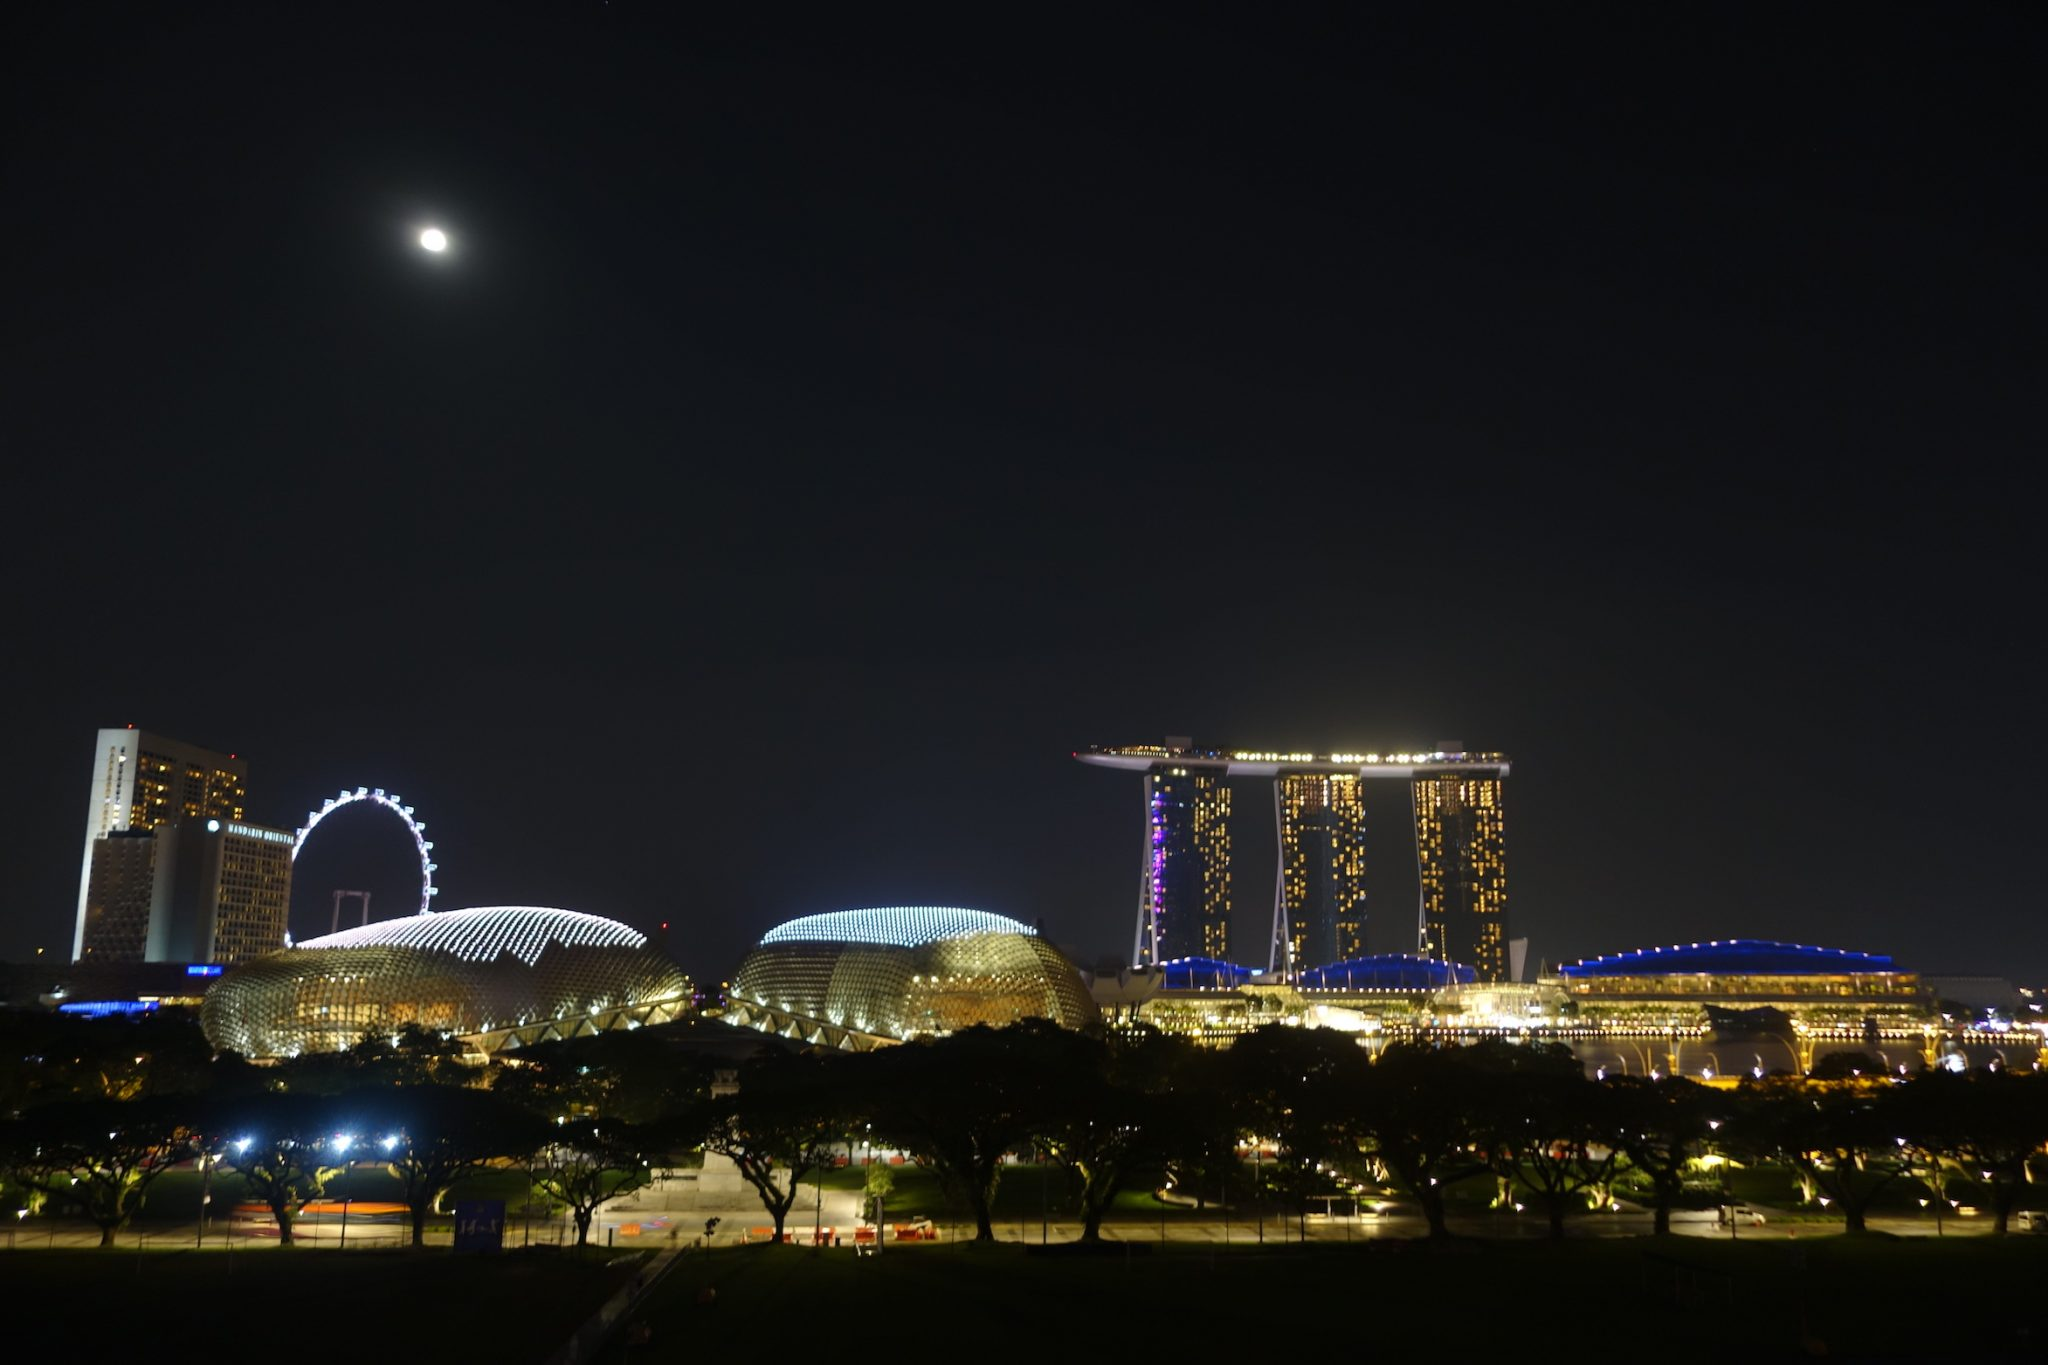 Singapur_CBD_MarinaBay_SkyBar_NationalGallery_1_Aussicht